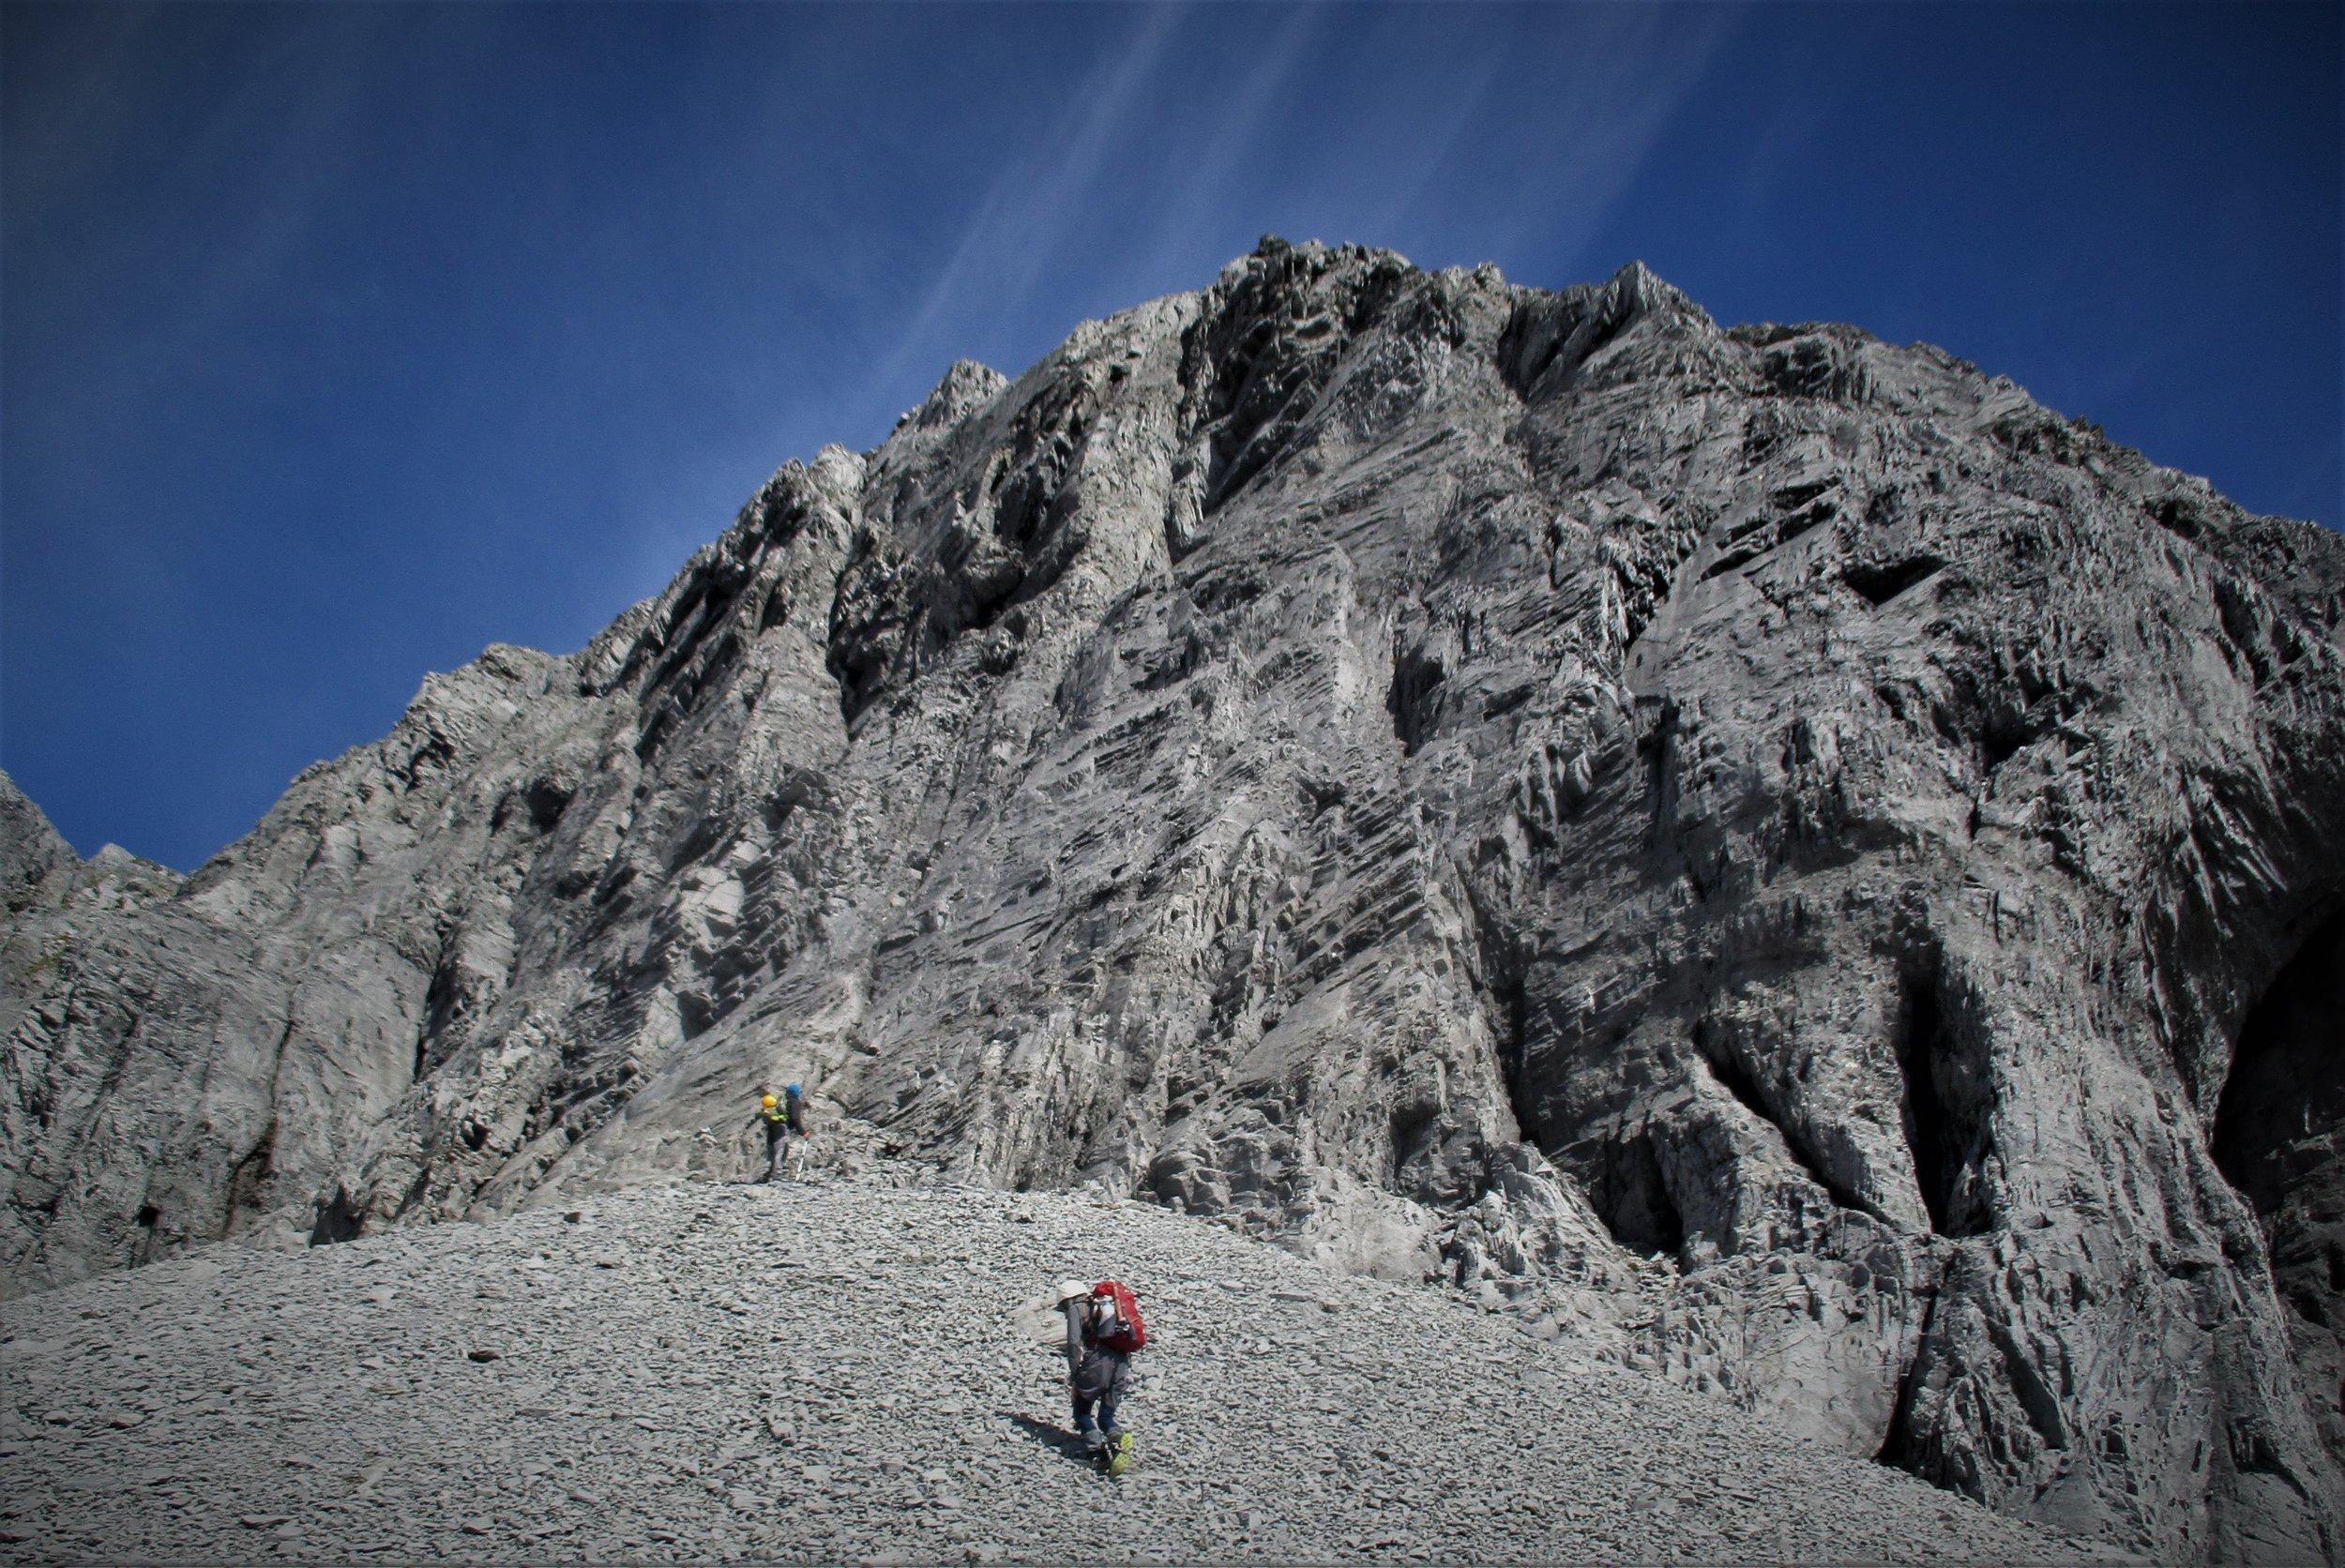 Big wall to climb on Arthur range